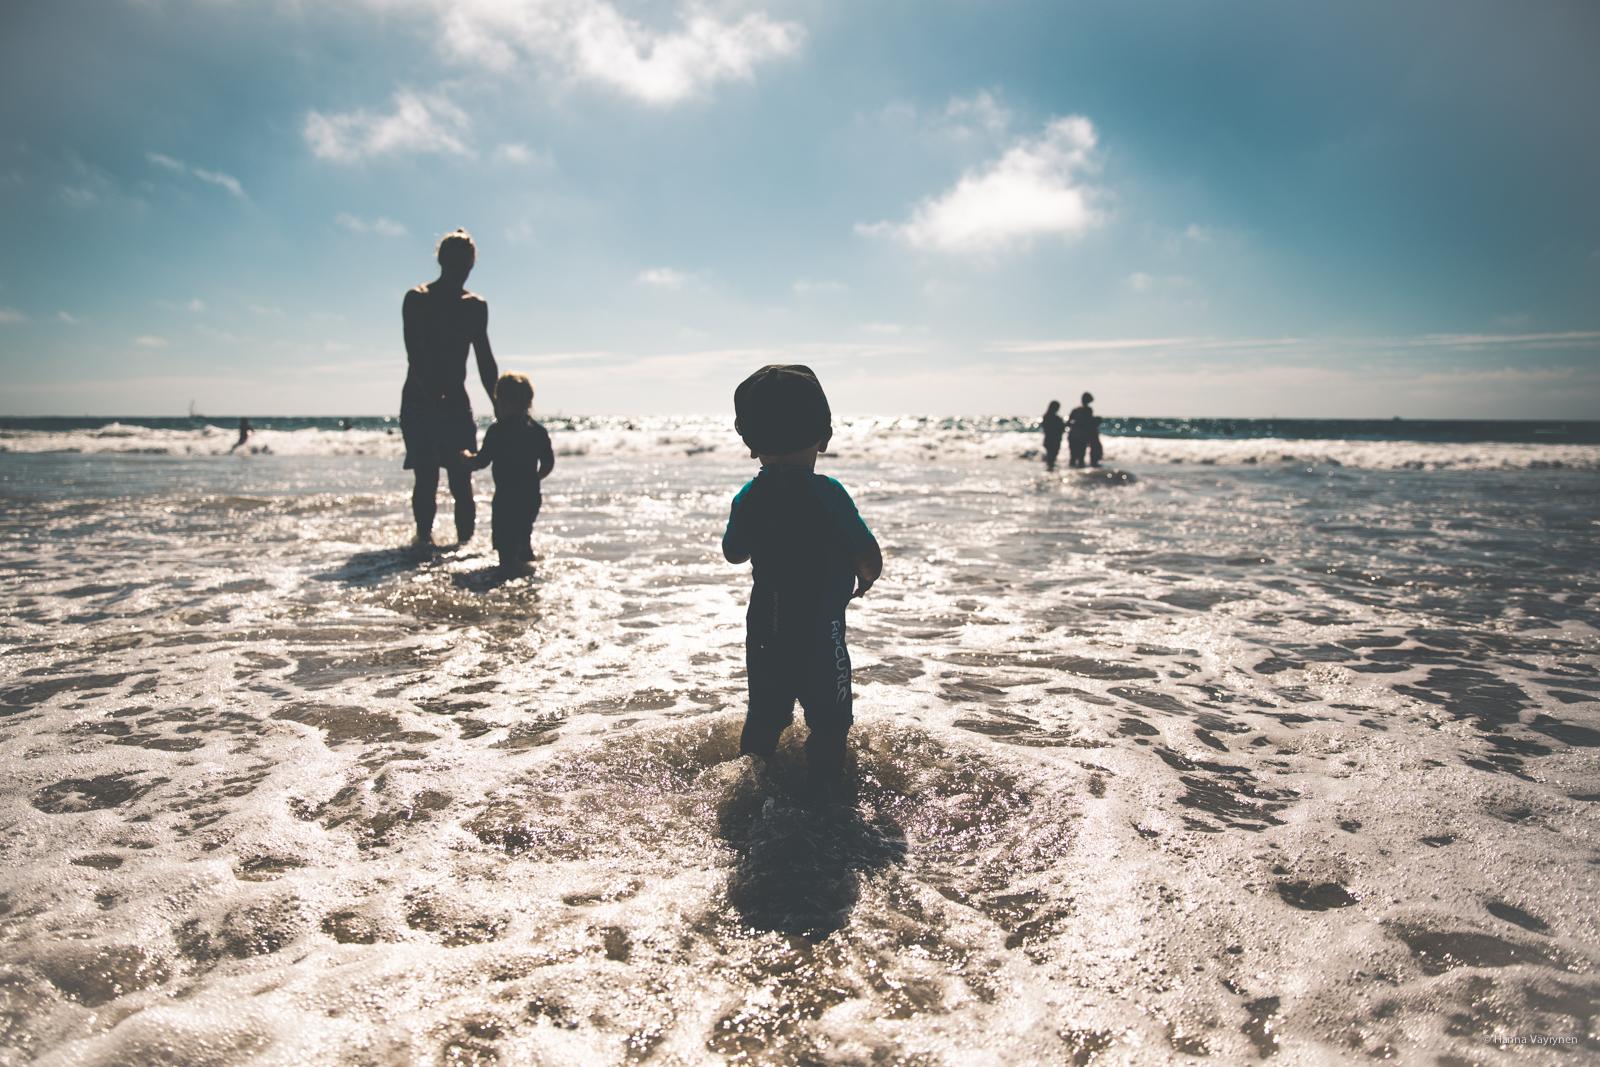 manhattan beach day -3133